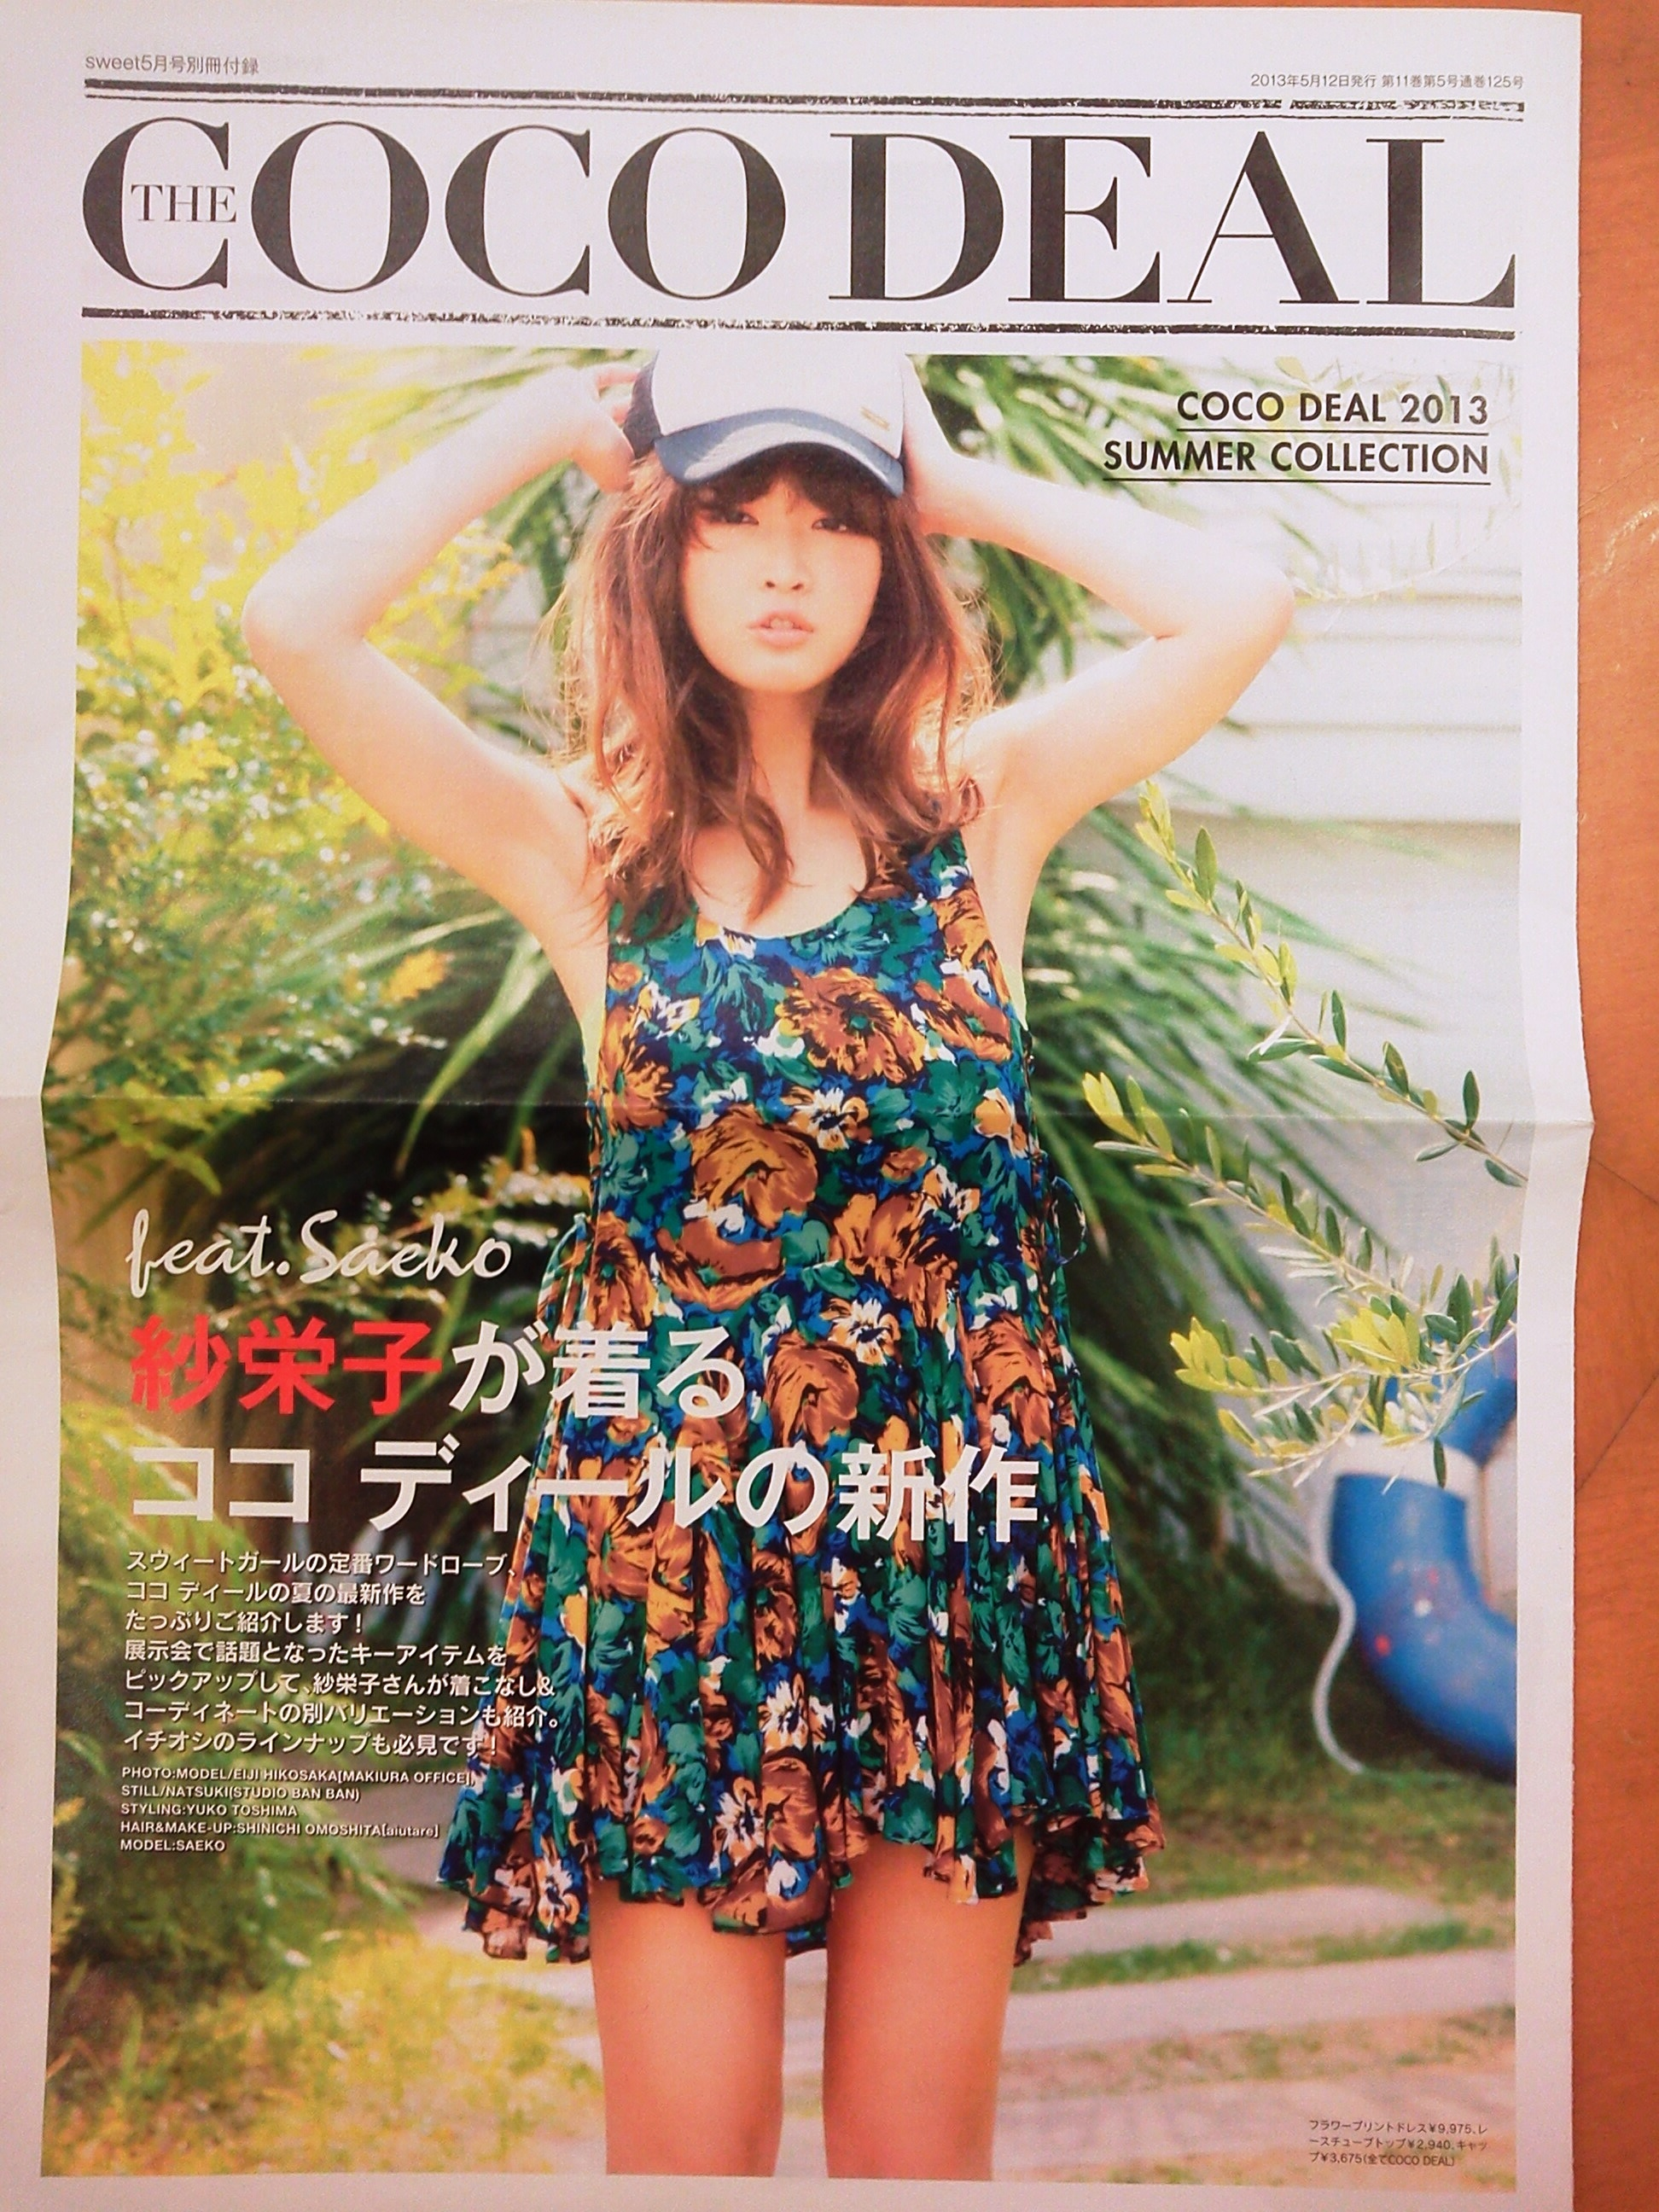 http://www.az-mitsui.com/blog/onoda/P1000482.JPG